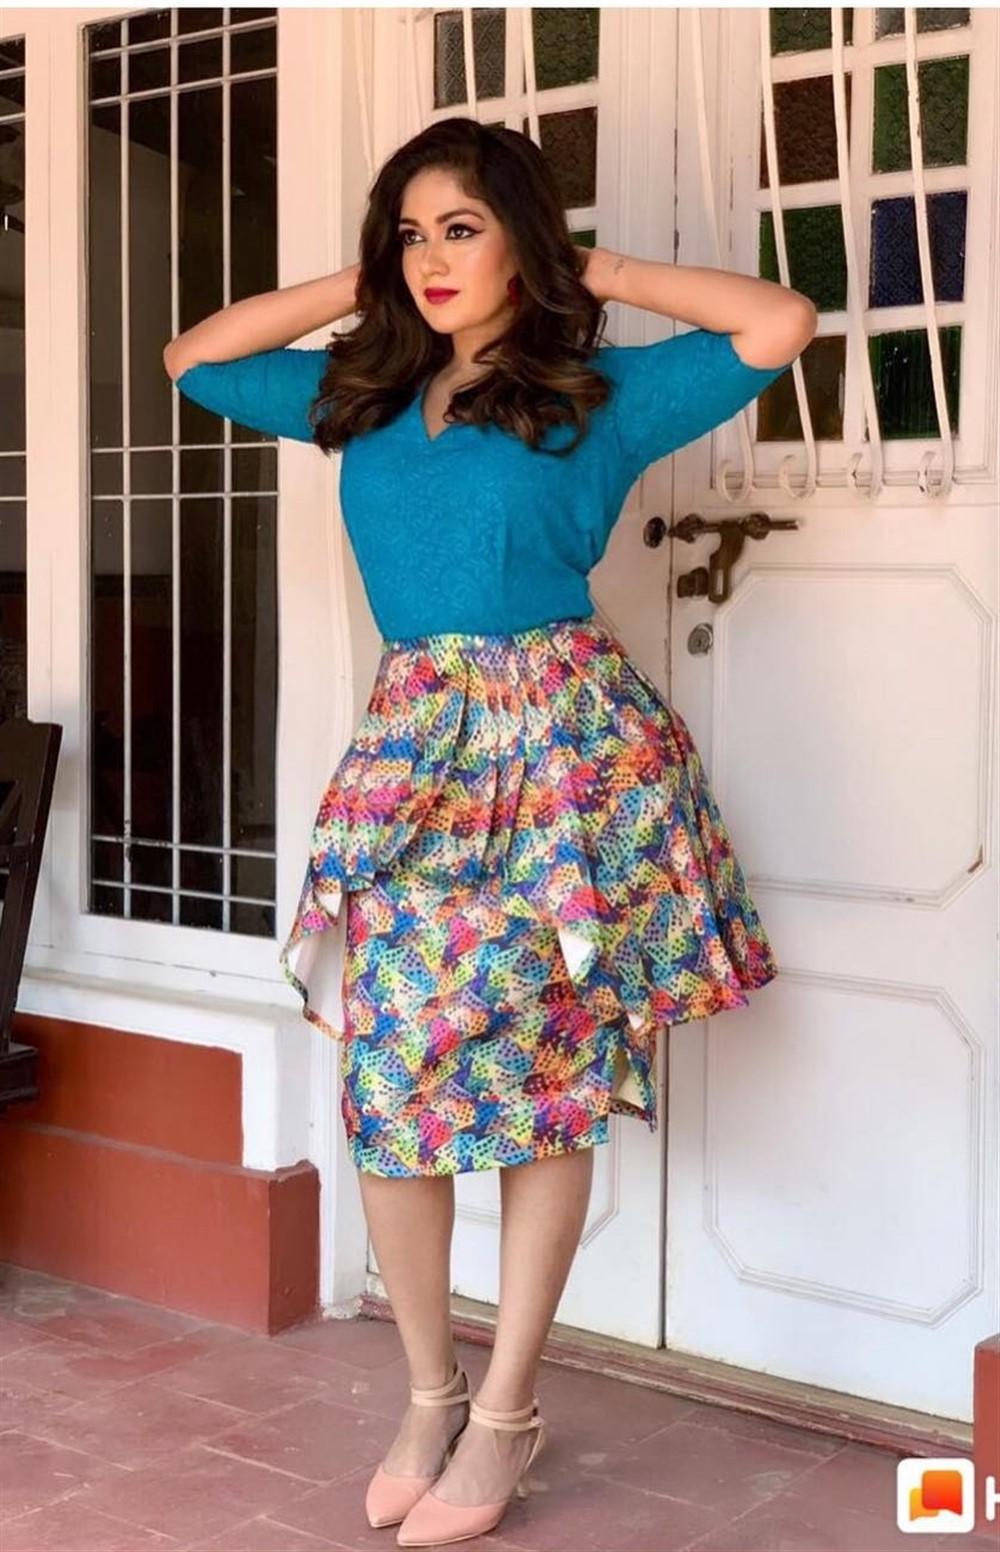 Actress Meghana Raj Latest Photoshoot Images